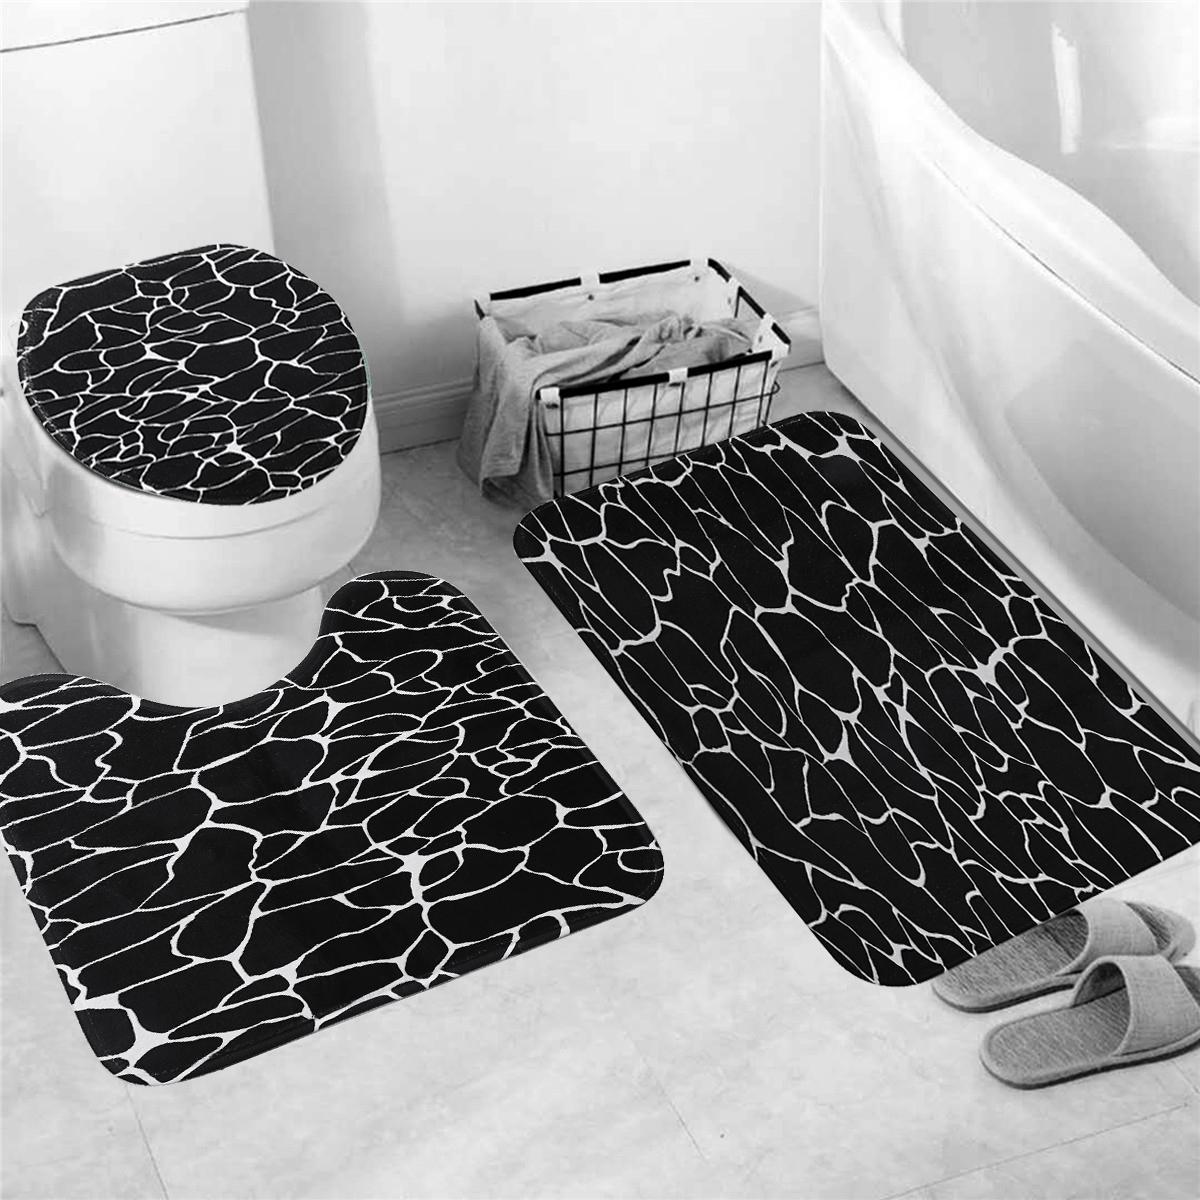 Bathroom Accessories Marble Shower Curtain Waterproof Bathroom Bath Mat Set Rug Toilet Lid Covers A Home Garden Yuki Be